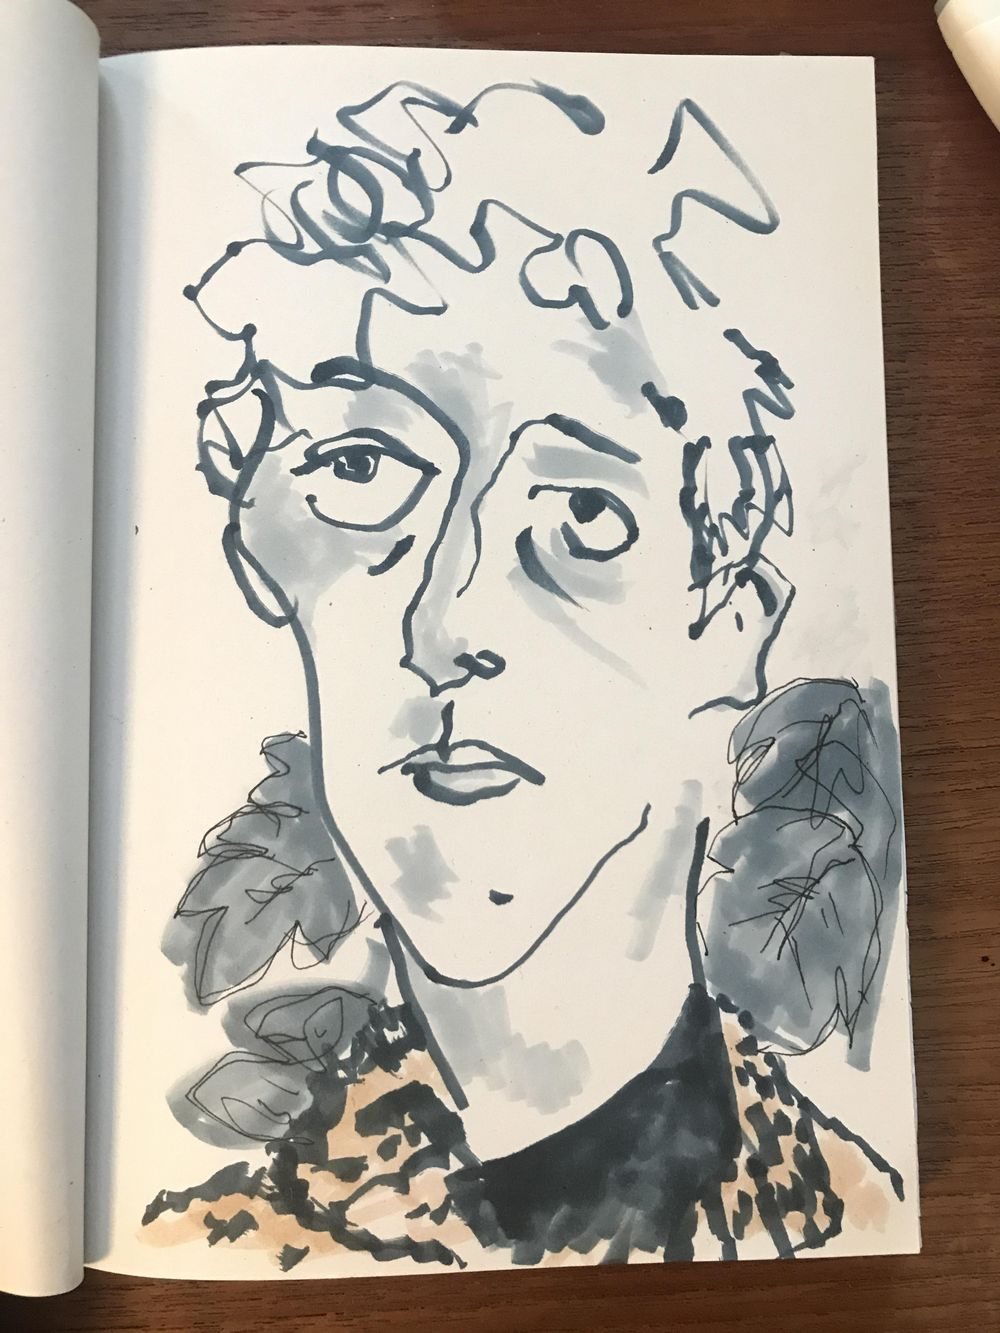 self-portrait - image 3 - student project